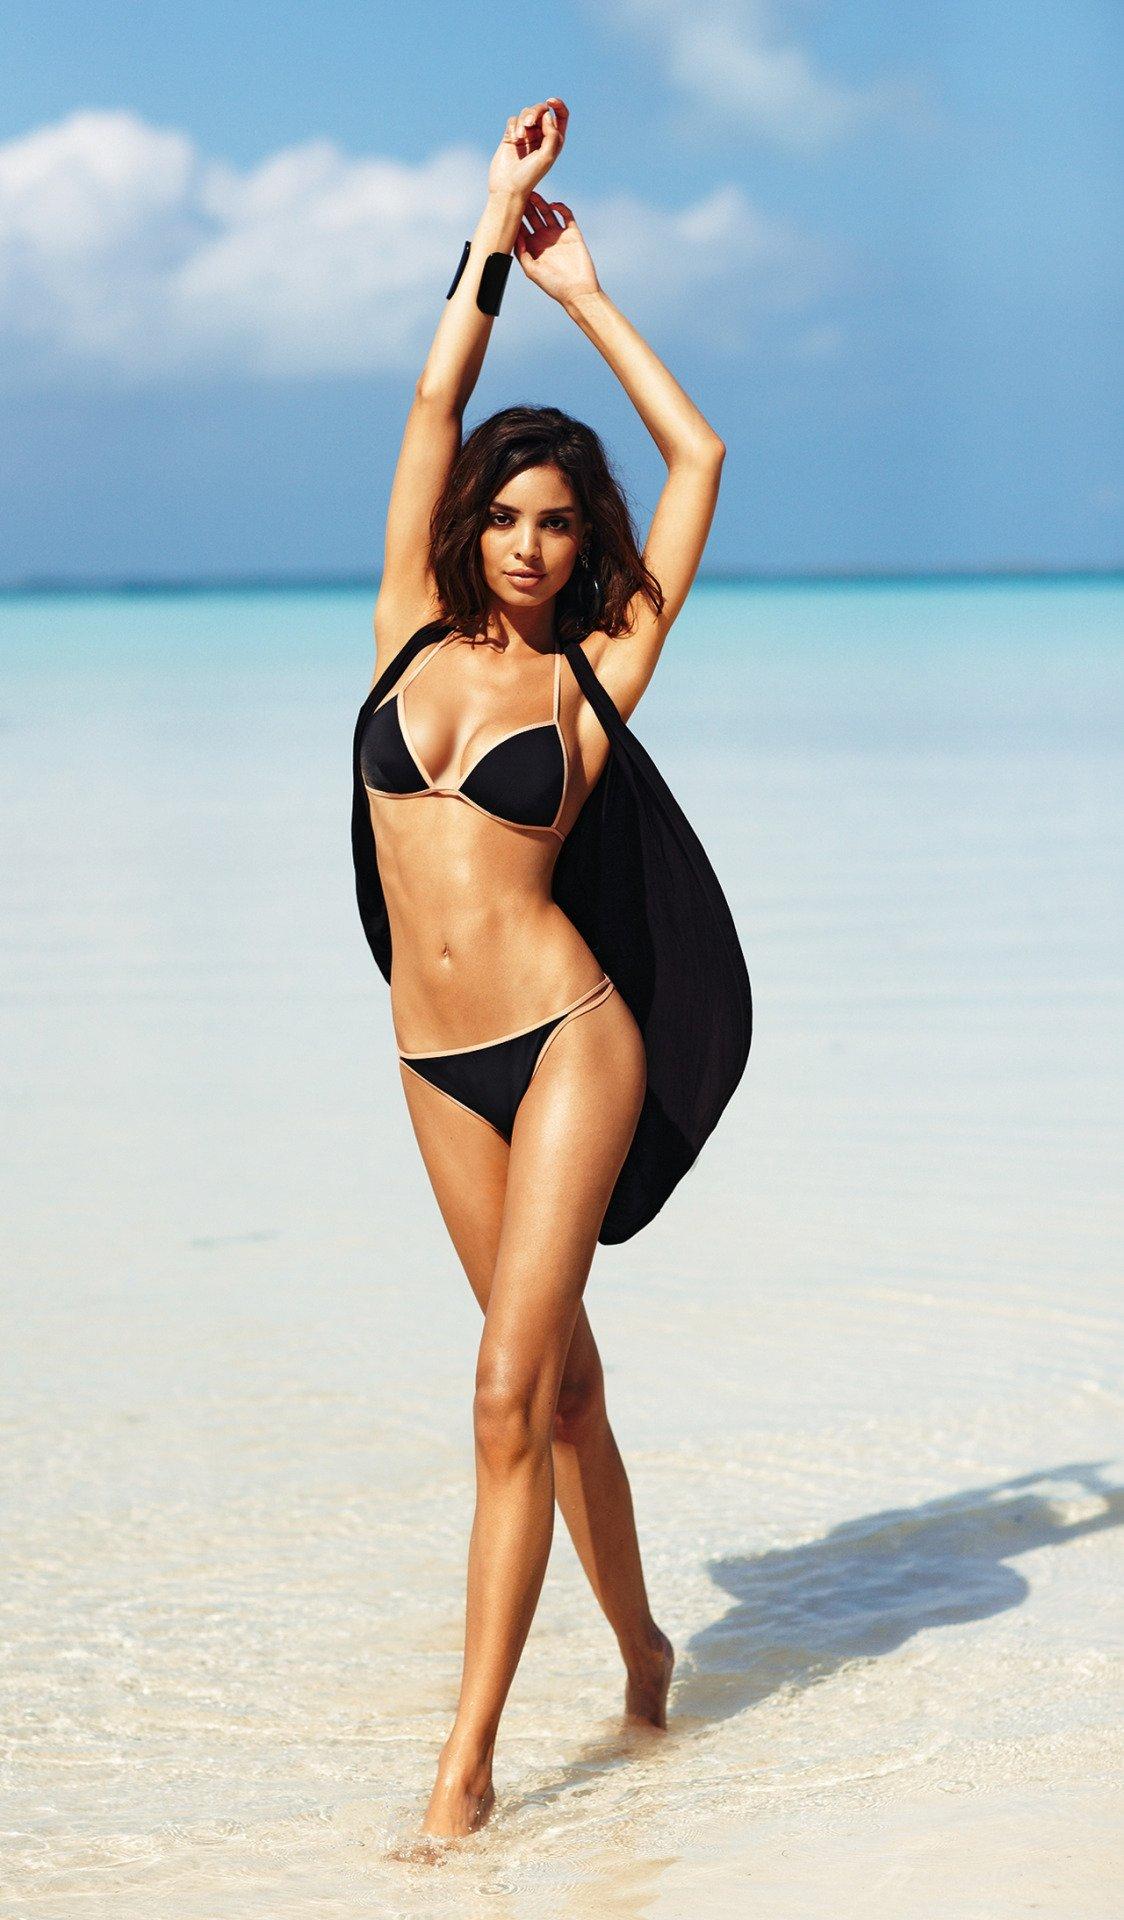 sabrina nait beach model girl swimsuit